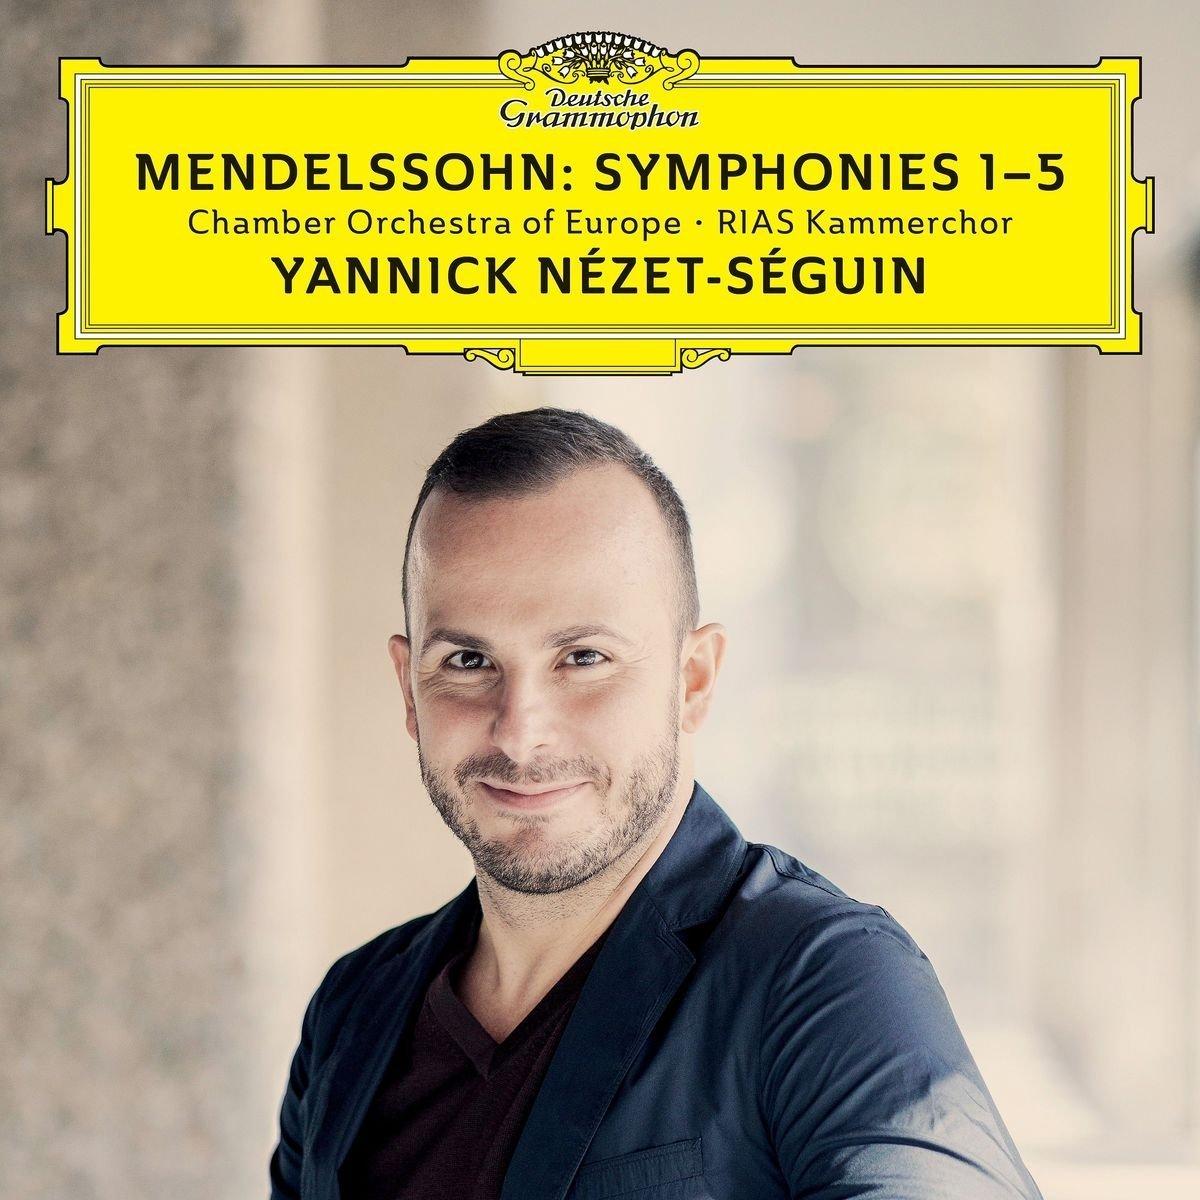 CD REVIEW: Felix Mendelssohn - SYMPHONIES NOS. 1 - 5 (Deutsche Grammophon 479 7337)